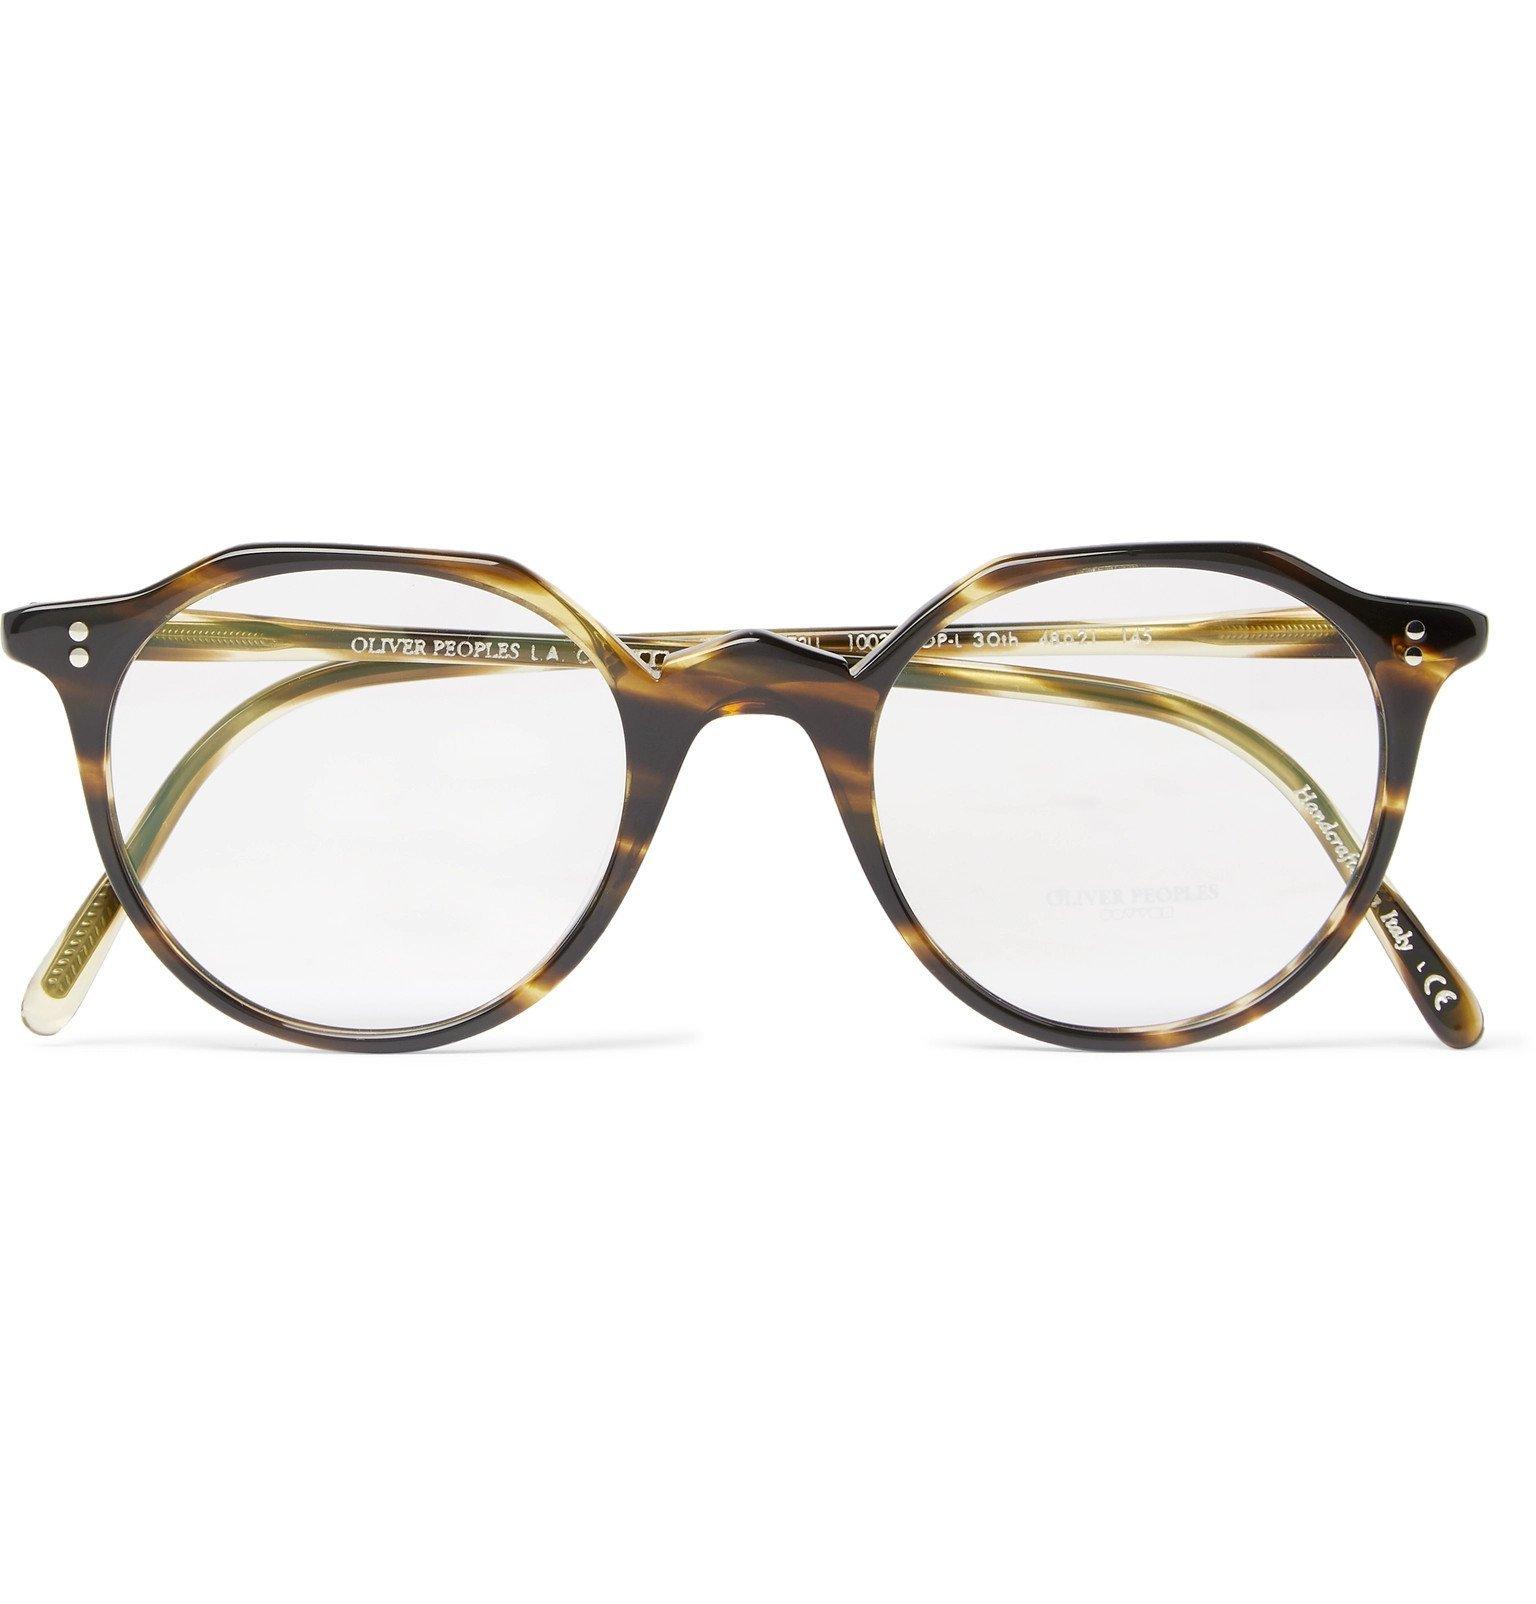 Oliver Peoples - OP-L 30th Round-Frame Tortoiseshell Acetate Optical Glasses - Tortoiseshell